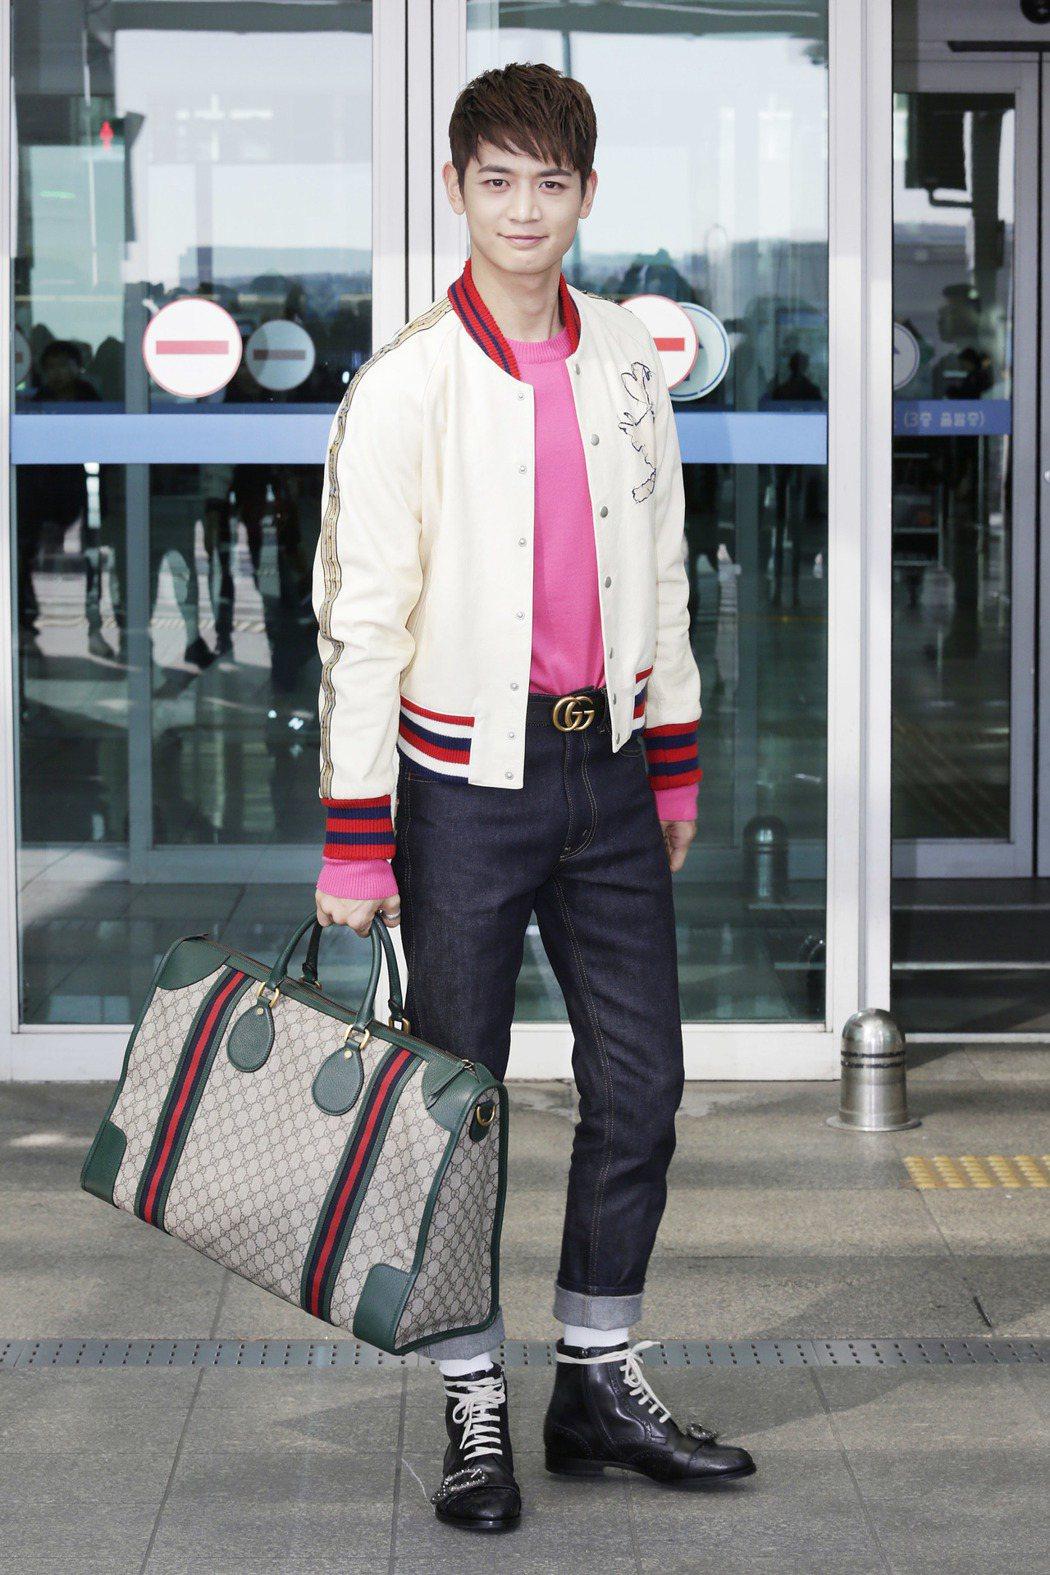 珉豪提帶 Gucci Neo Vintage 旅行袋。圖/Gucci提供